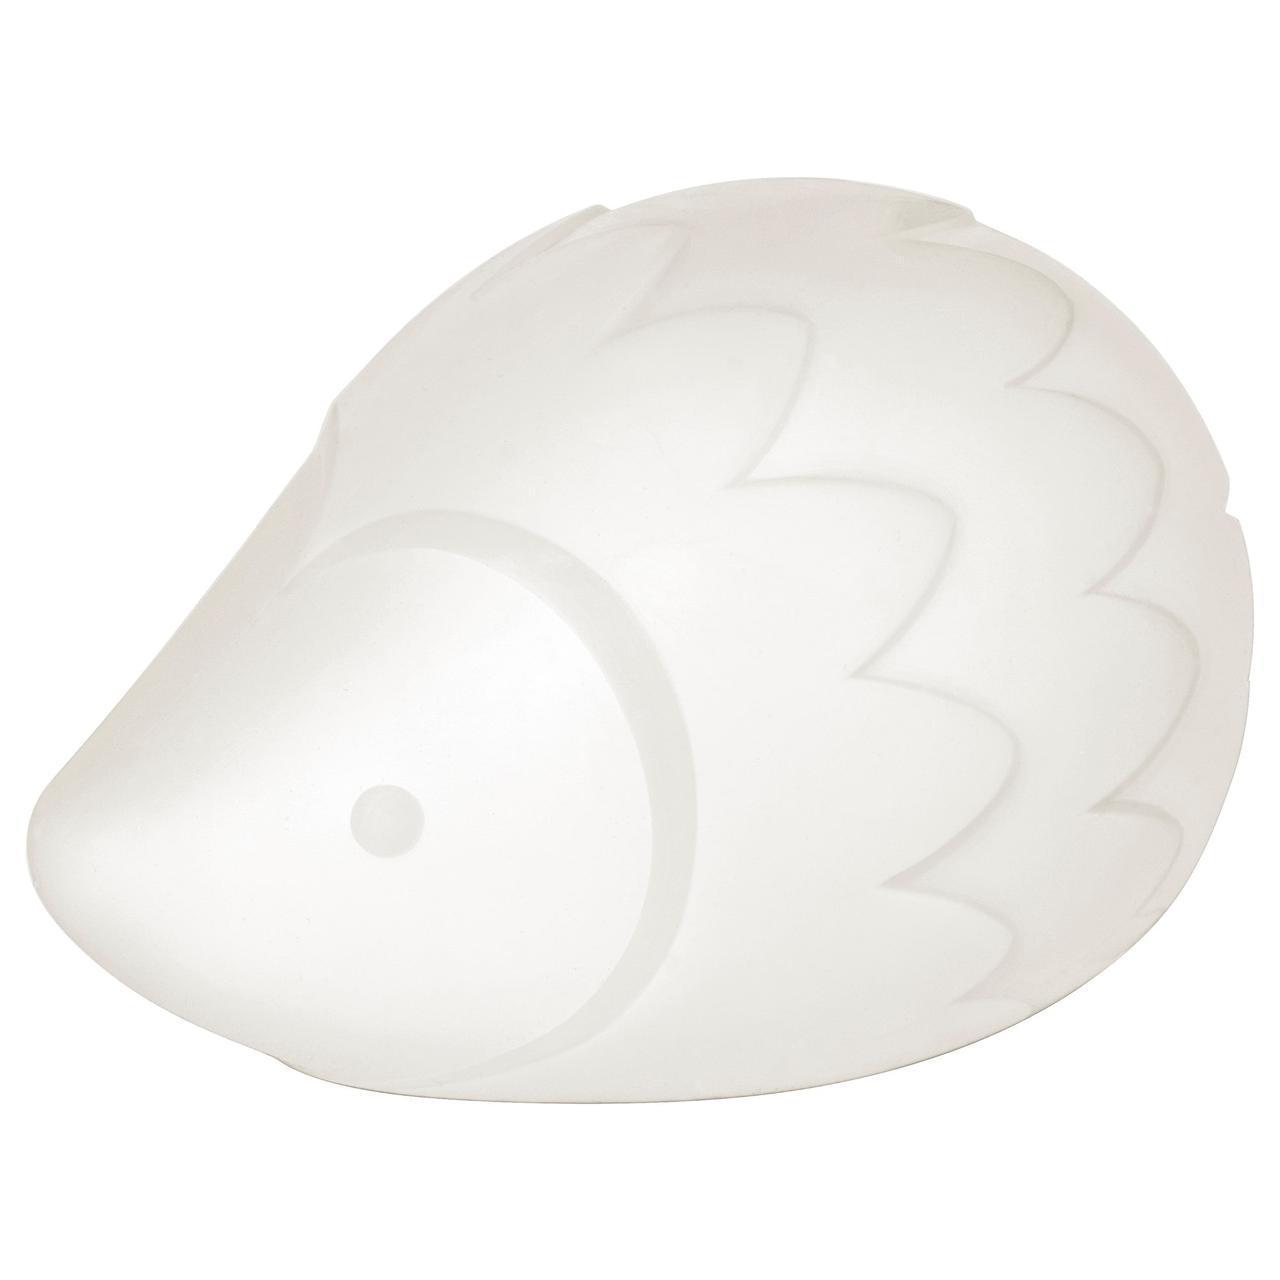 ✅ IKEA LURIGA (003.258.29) Светодиодный ночник, белый, озеро